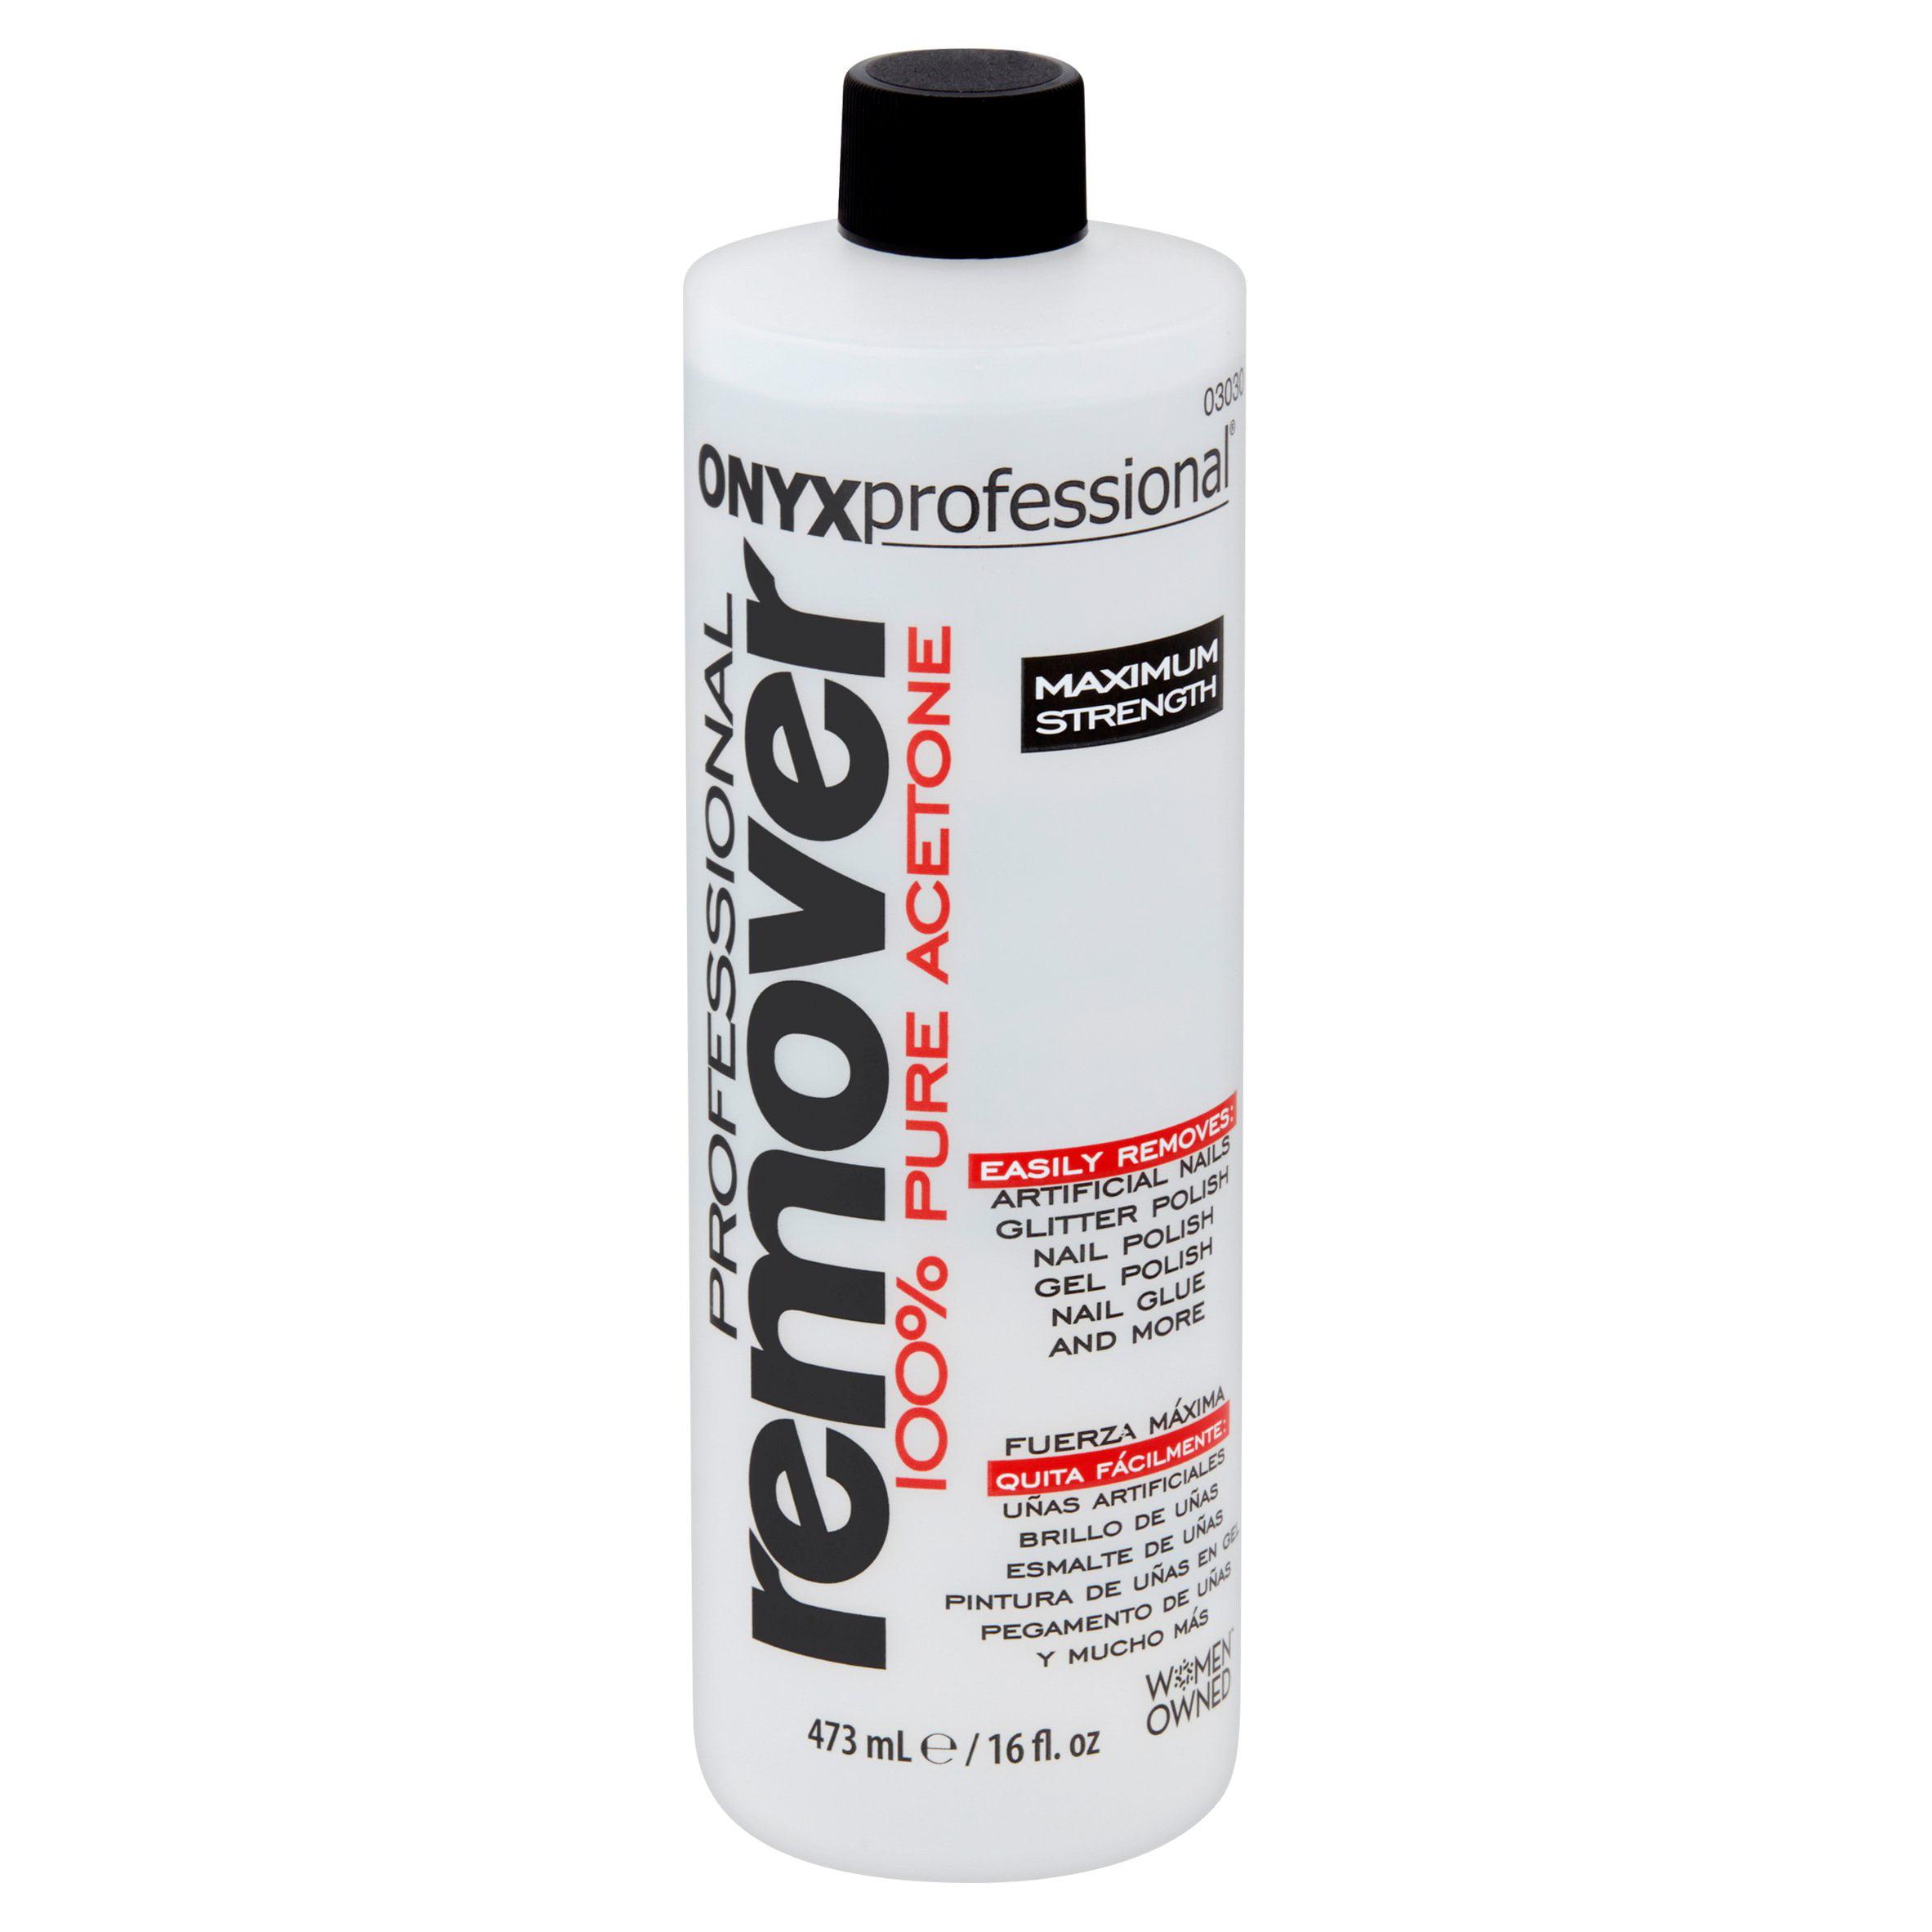 ONYX Professional 100% pure acetone nail polish remover - Walmart.com